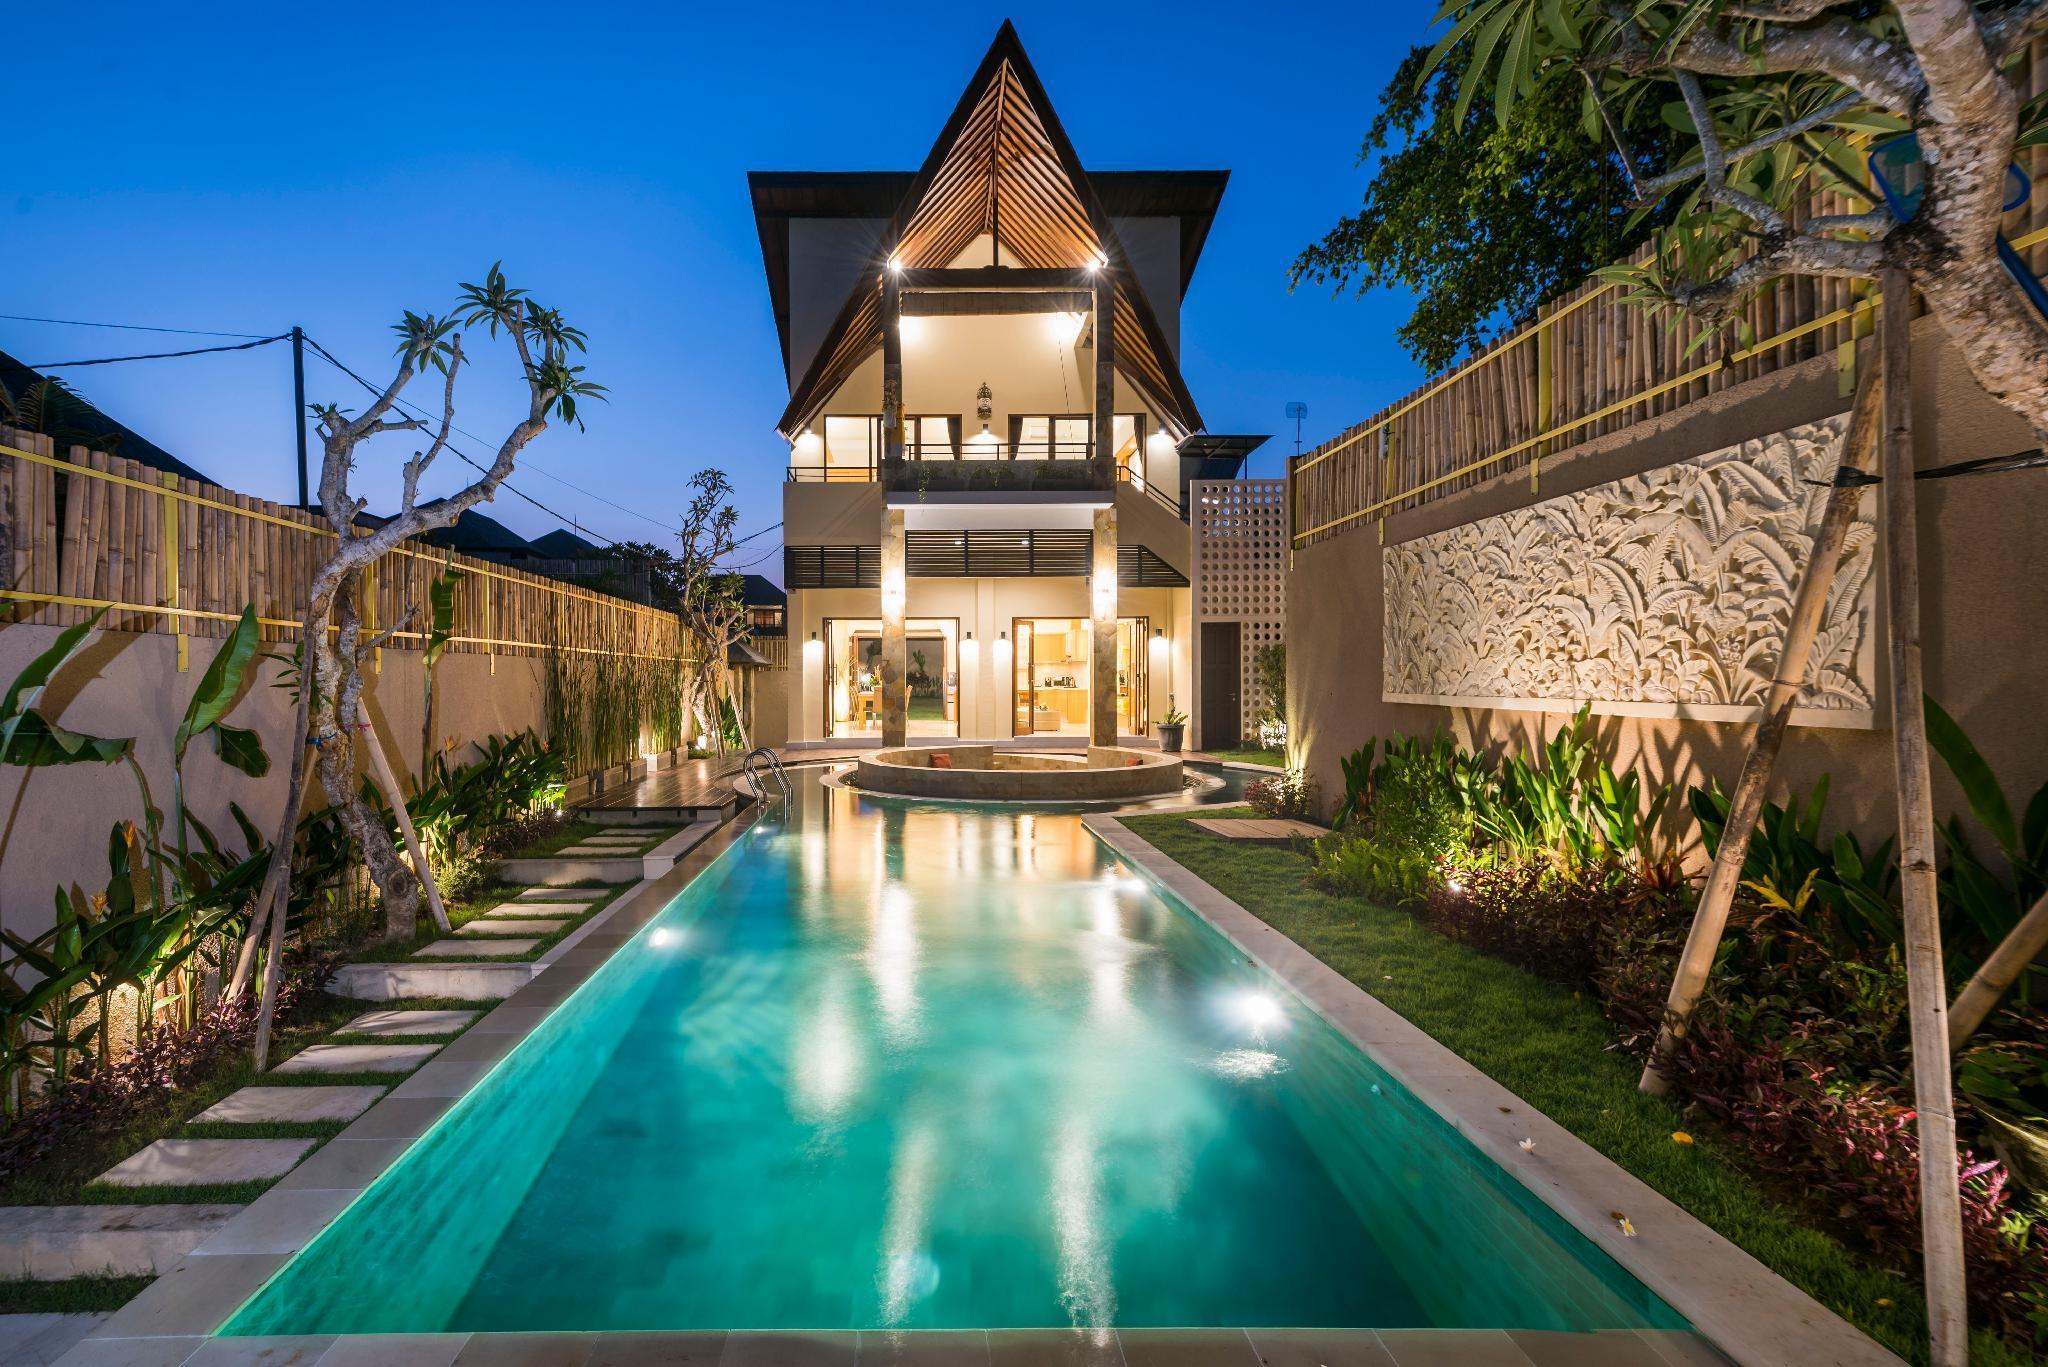 Villa COCO *BEACH 500m *LUXURY *HUGE POOL And GARDEN